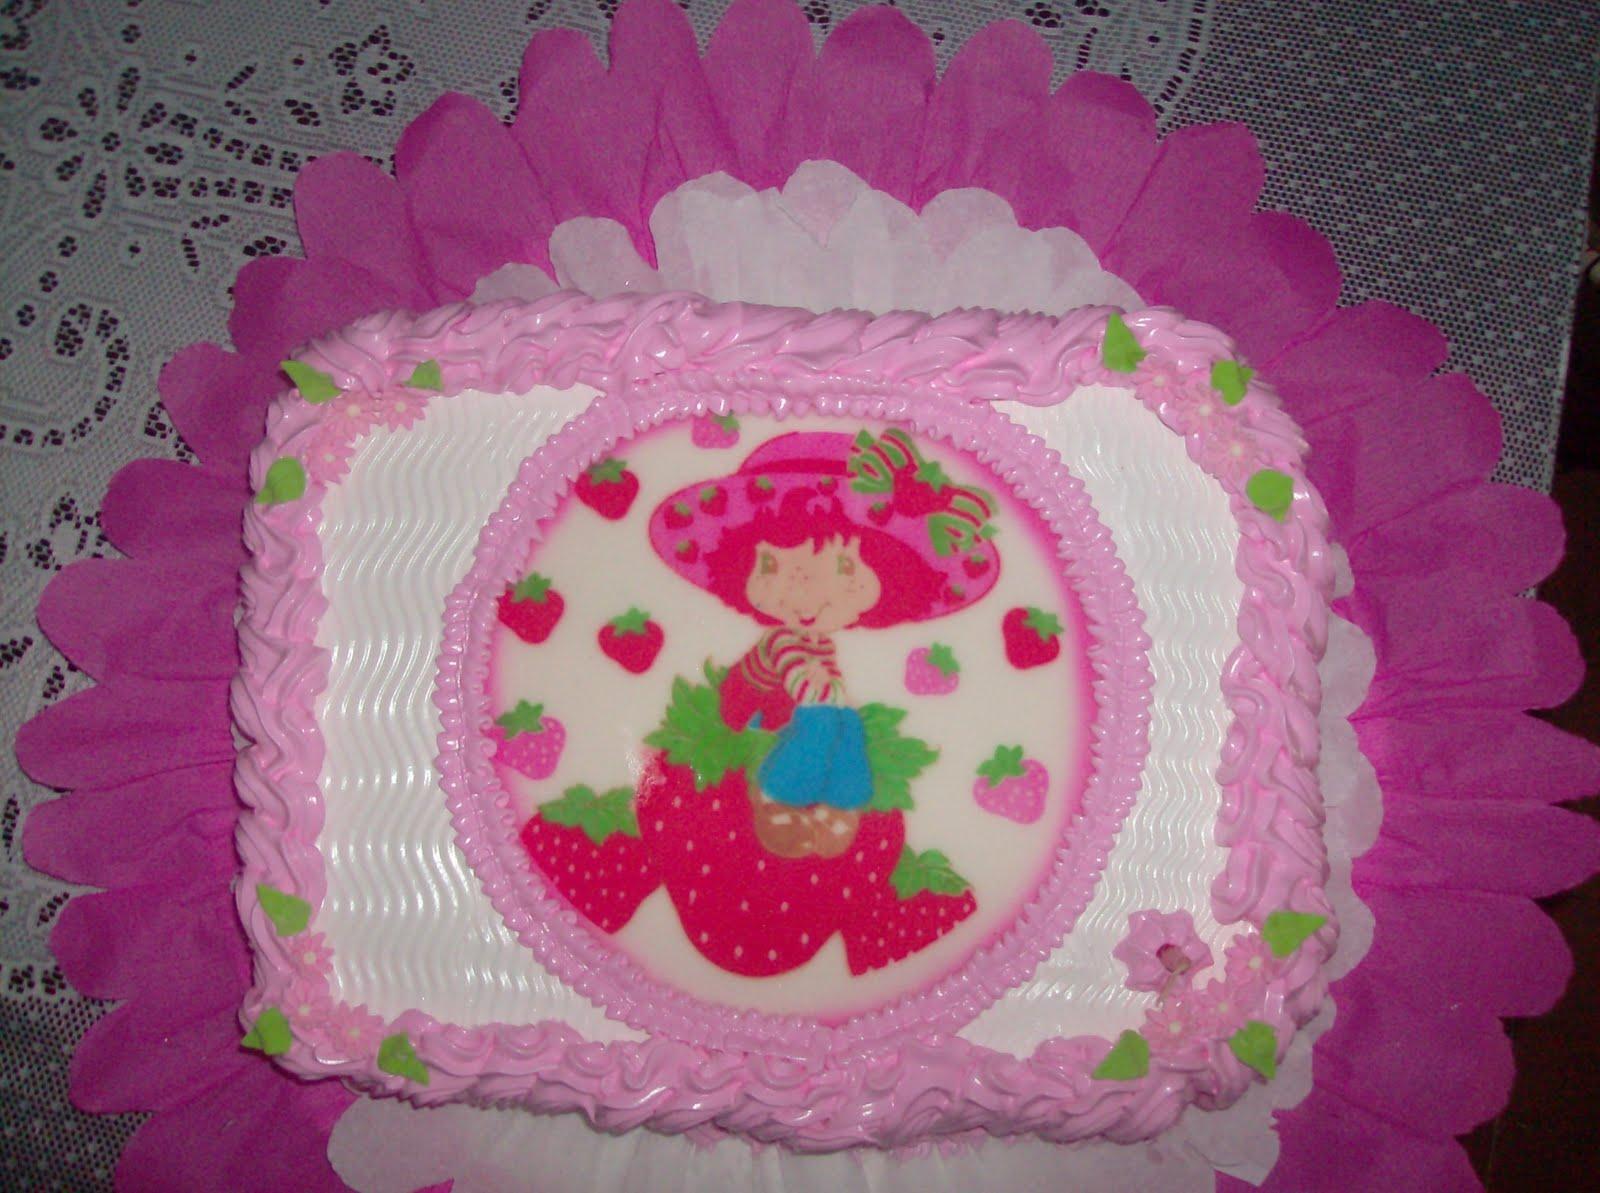 Tortas decoradas infantiles de fresita - Imagui